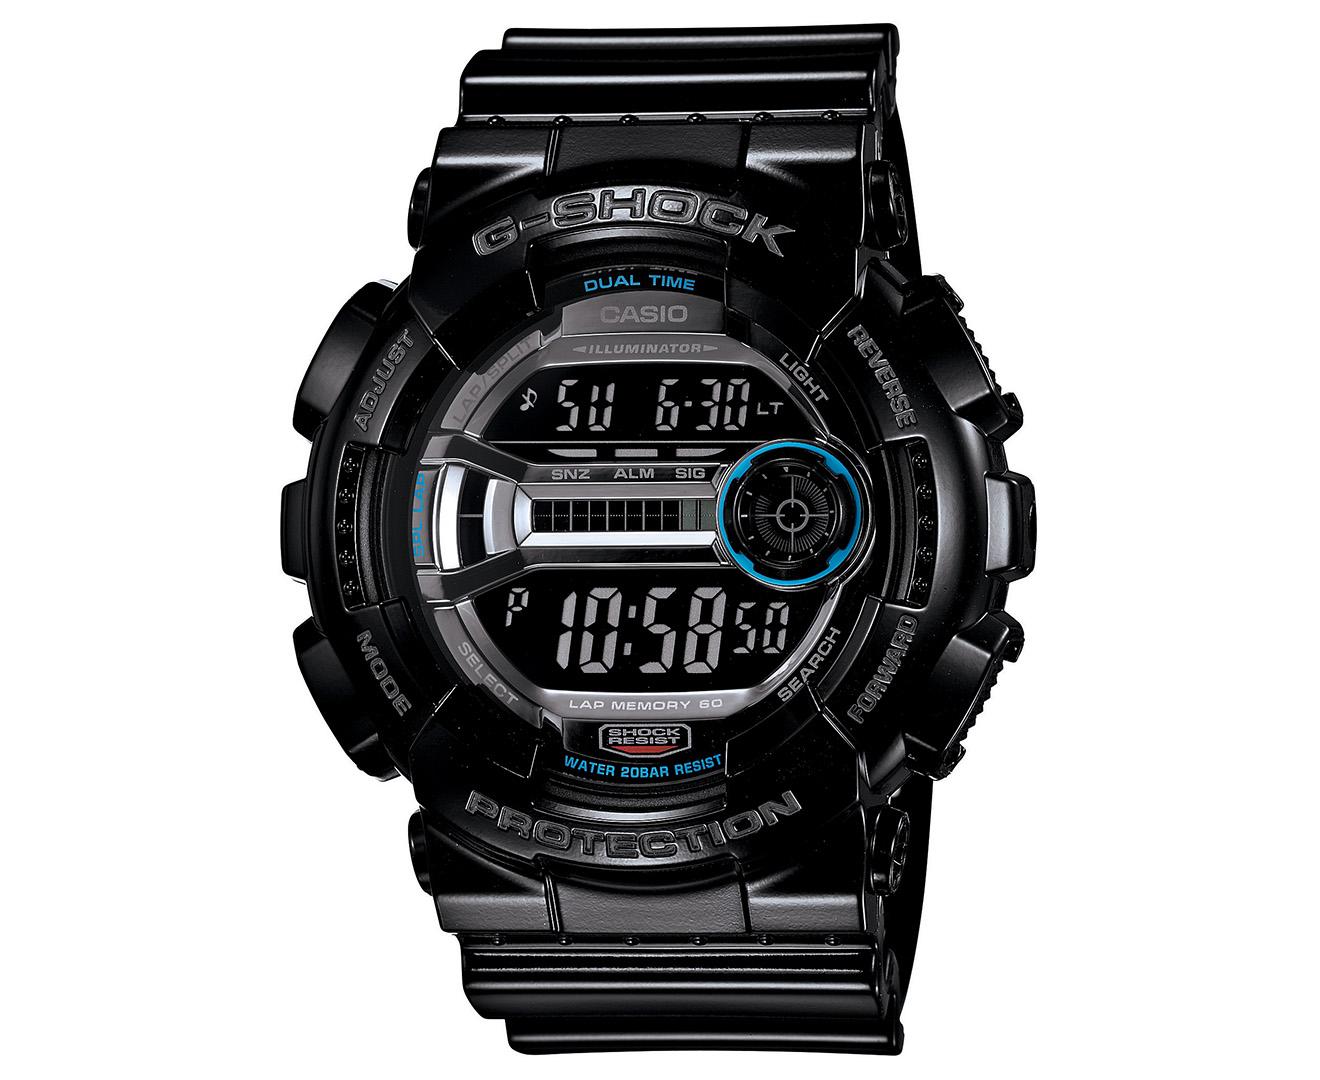 Casio Men U0026 39 S G-shock Gd110-1d Xl Digital Series Watch